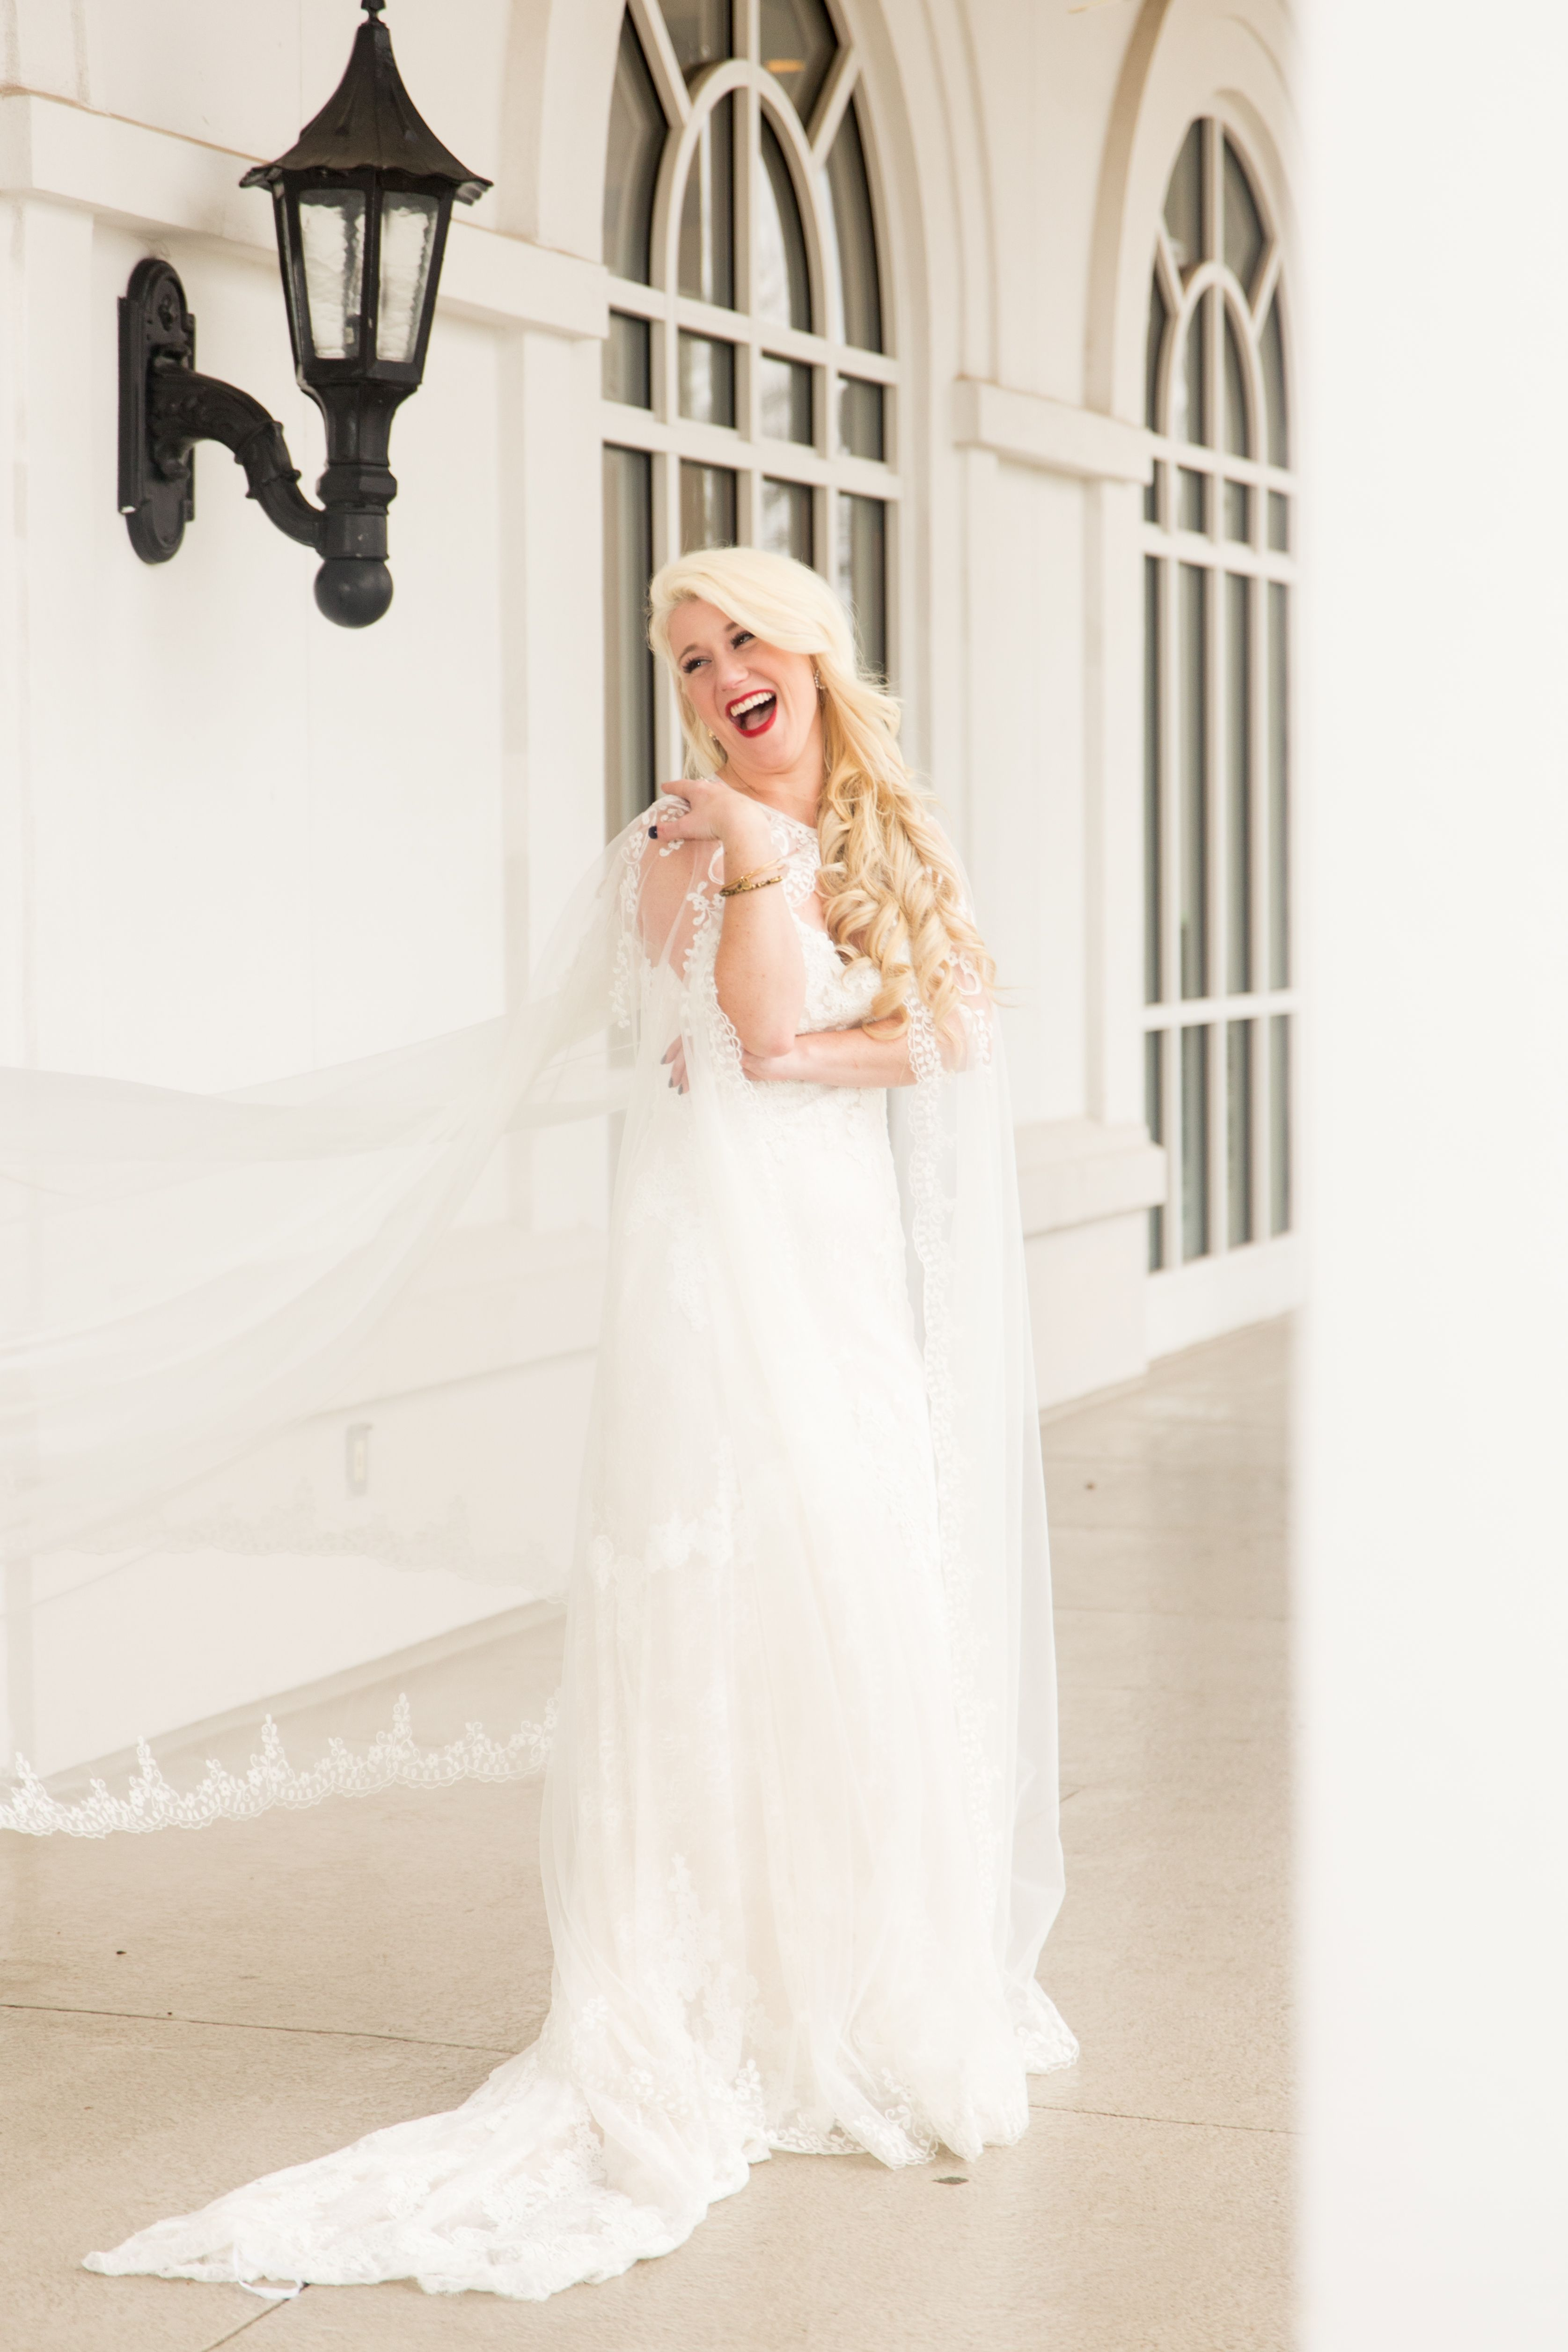 ashley's platinum blonde, hollywood wedding hair is almost